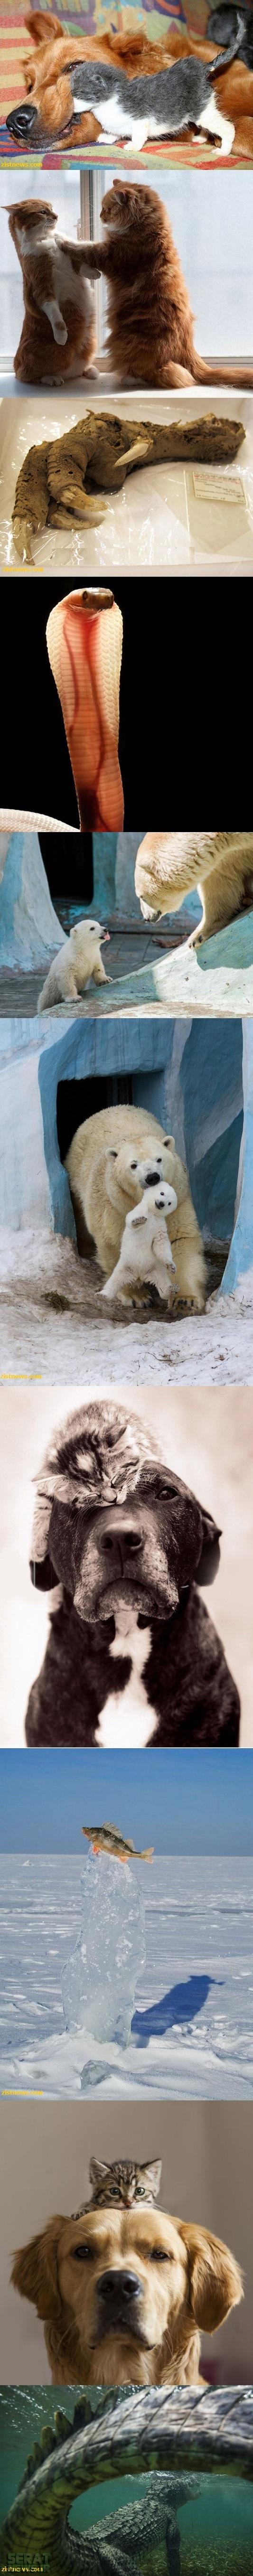 تصاویر / حیوانات/ بدون شرح